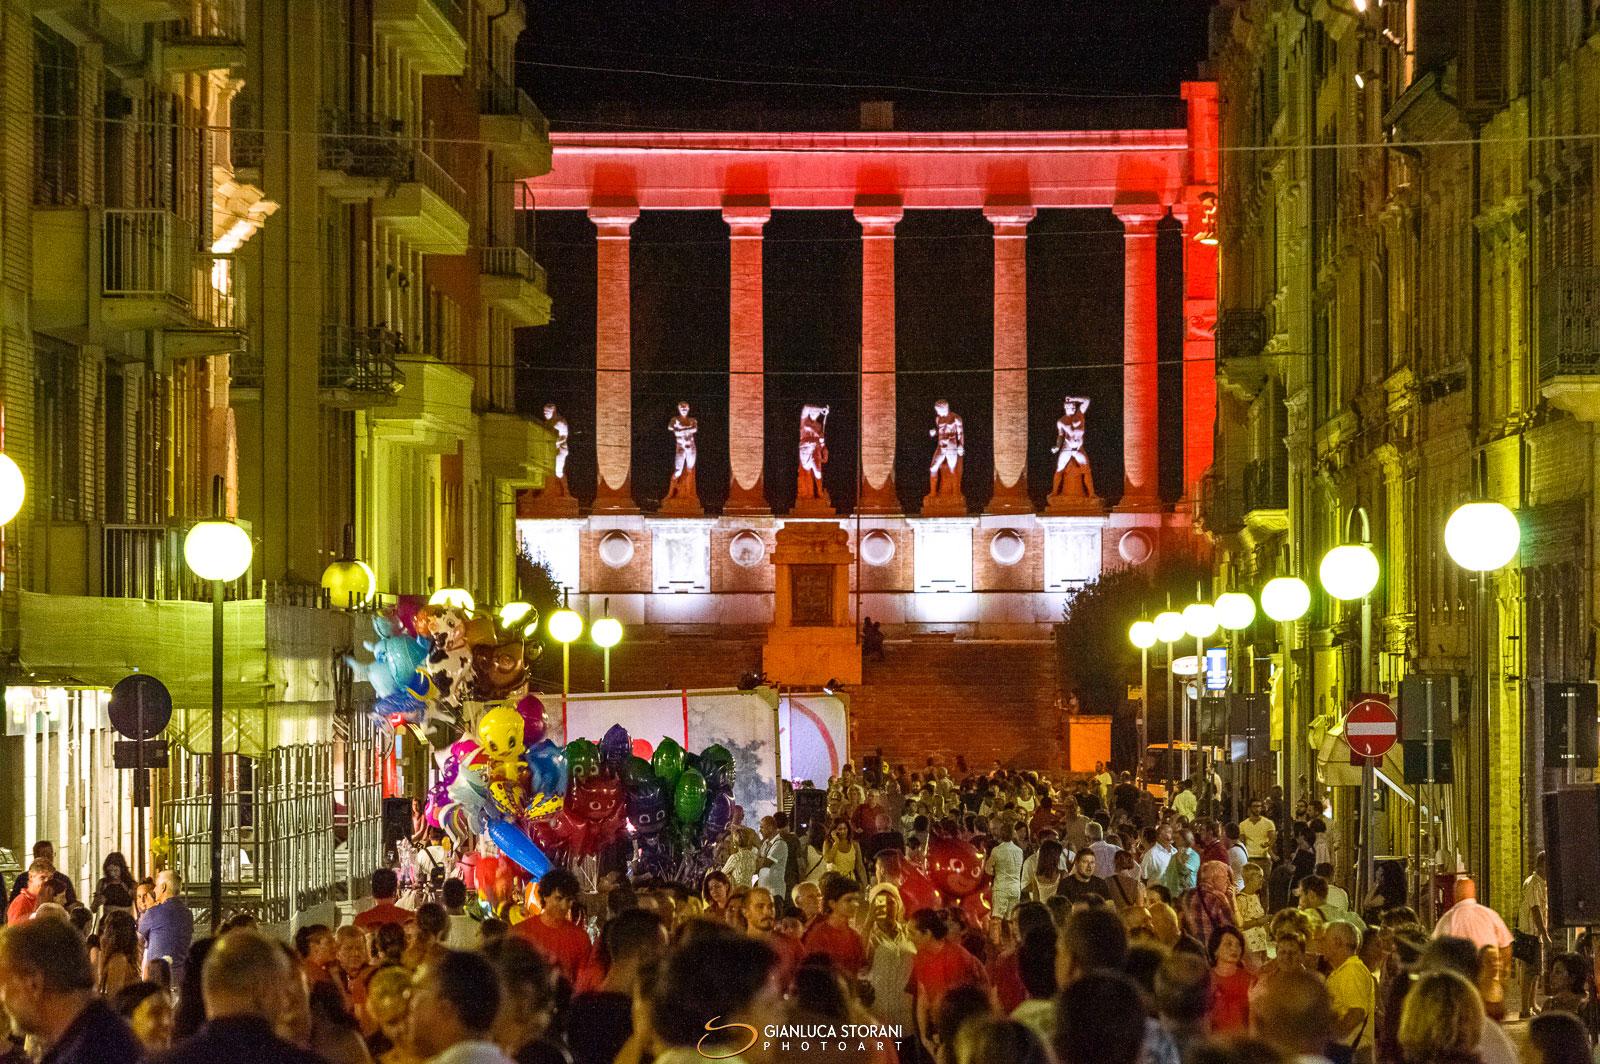 Notte dell'Opera 2017 - Gianluca Storani Photo Art (ID: 4-1418)